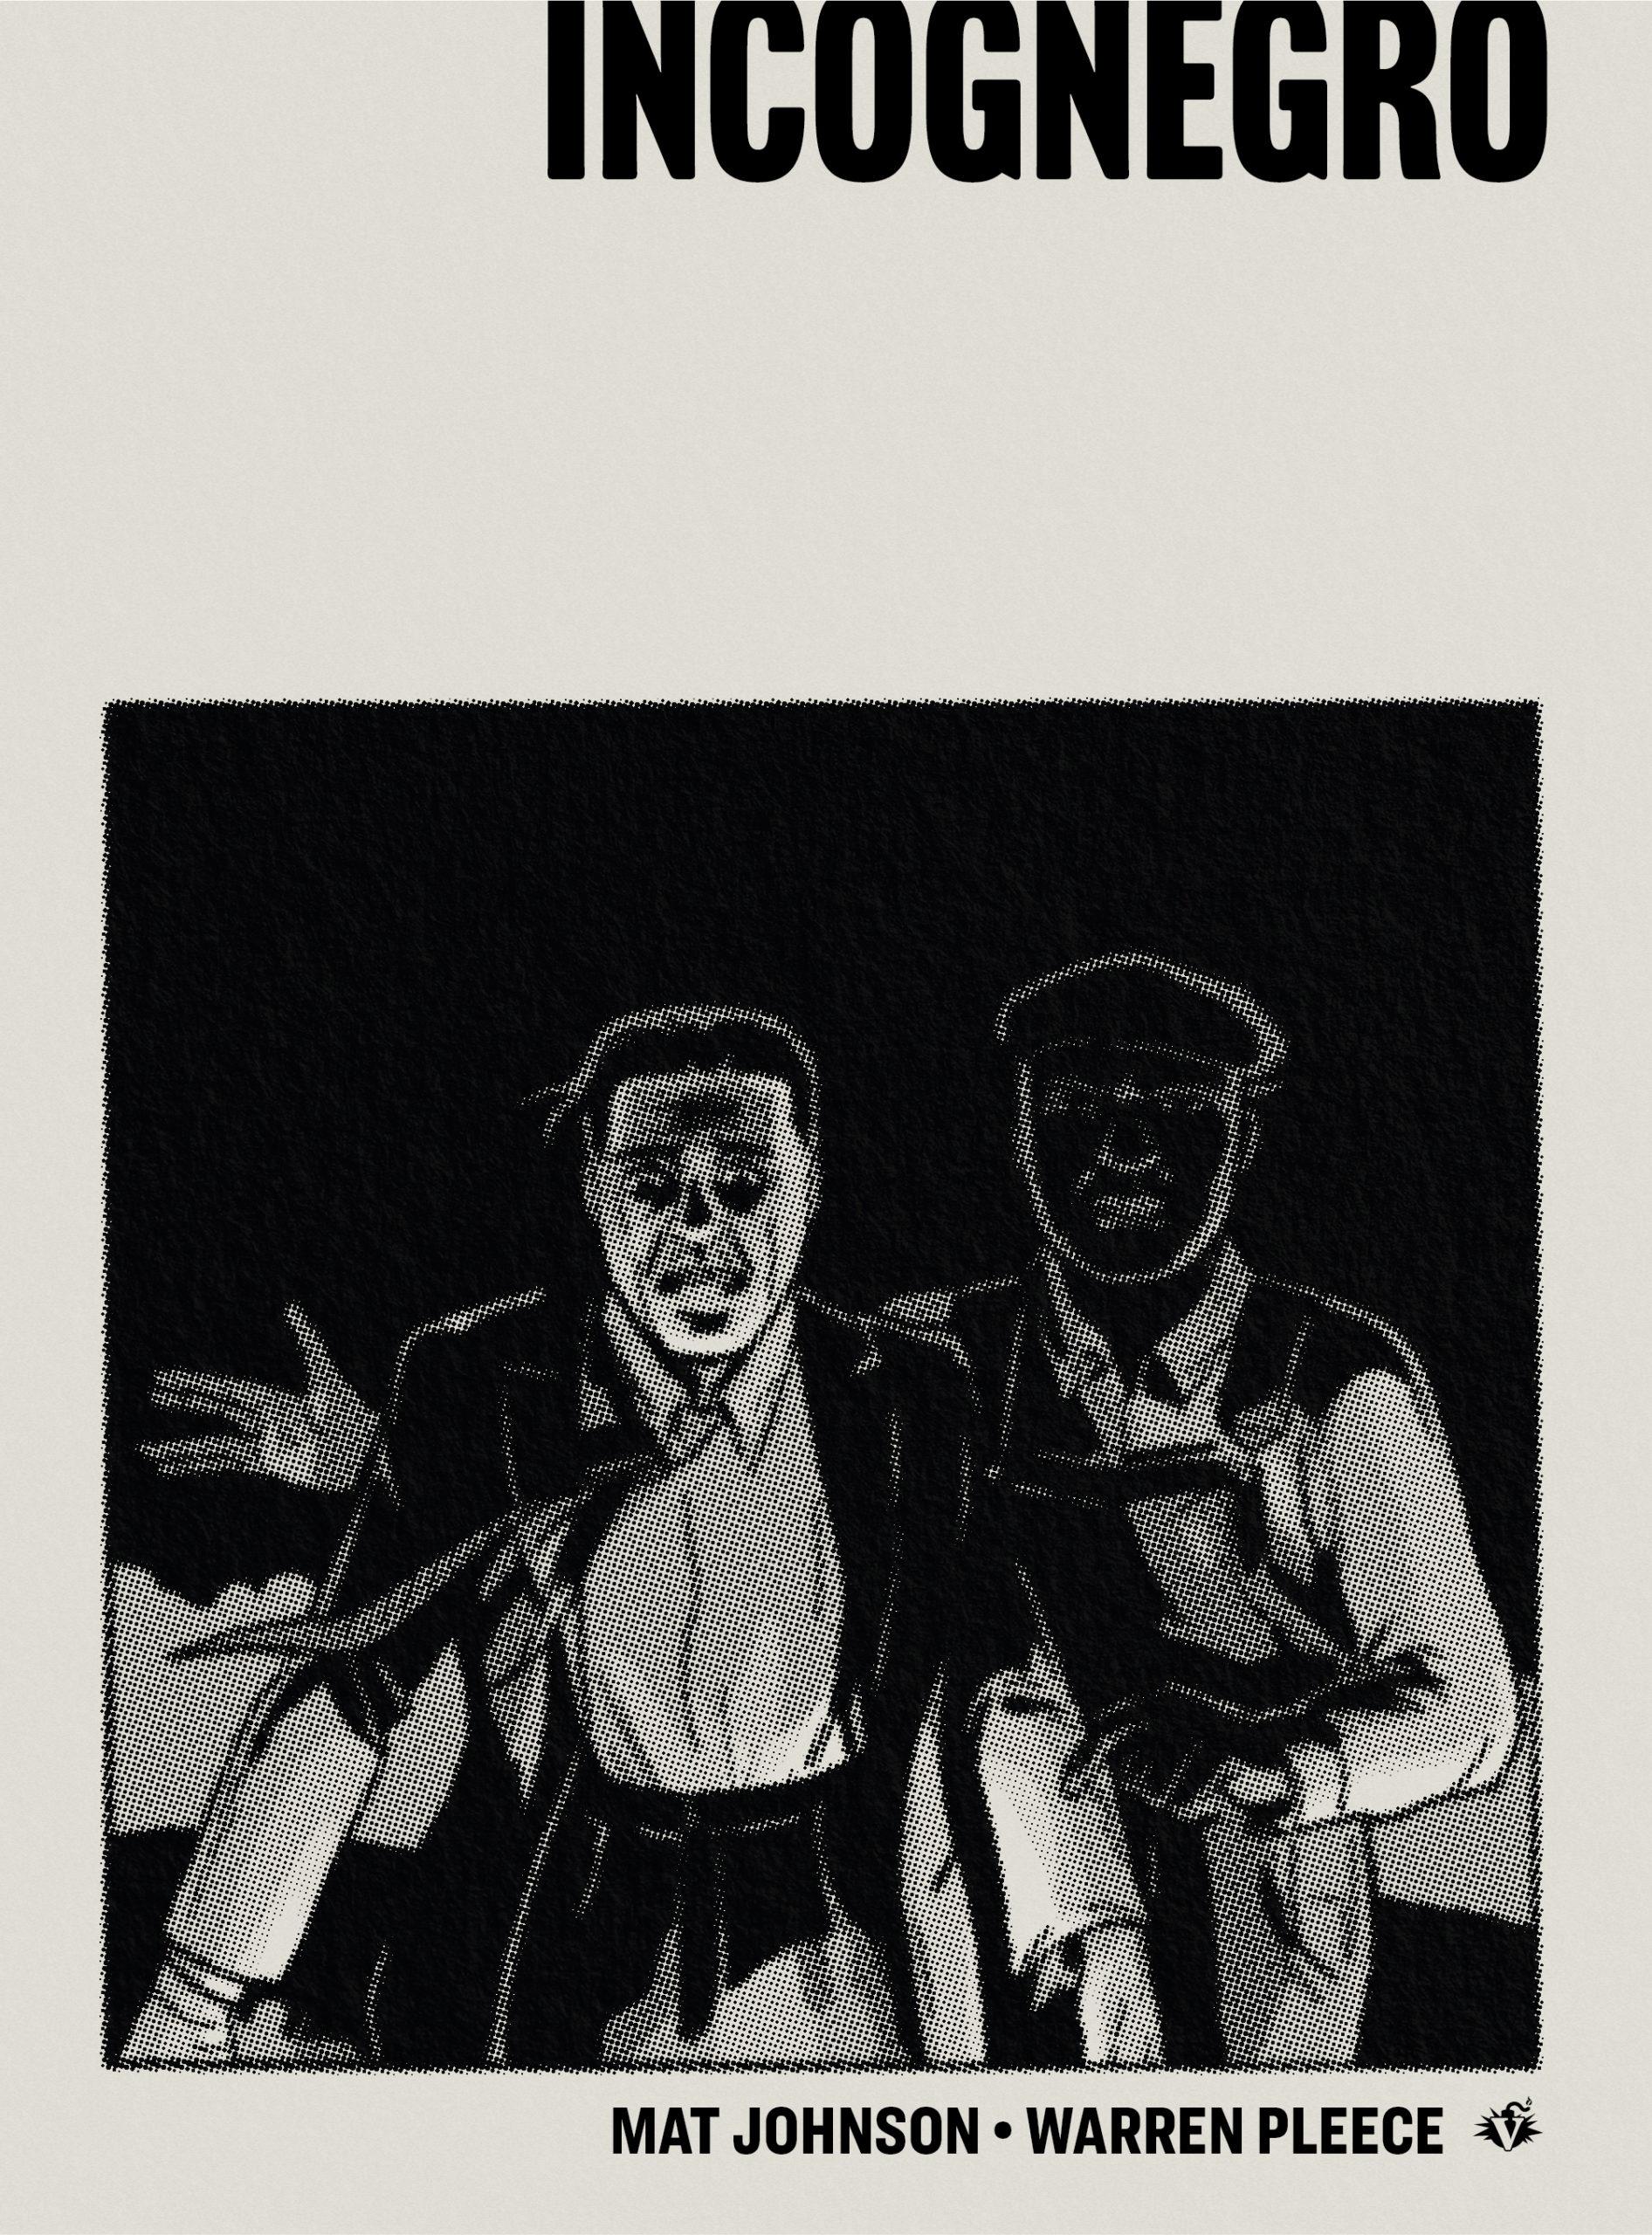 Incognegro, livro de Mat Johnson, Warren Pleece